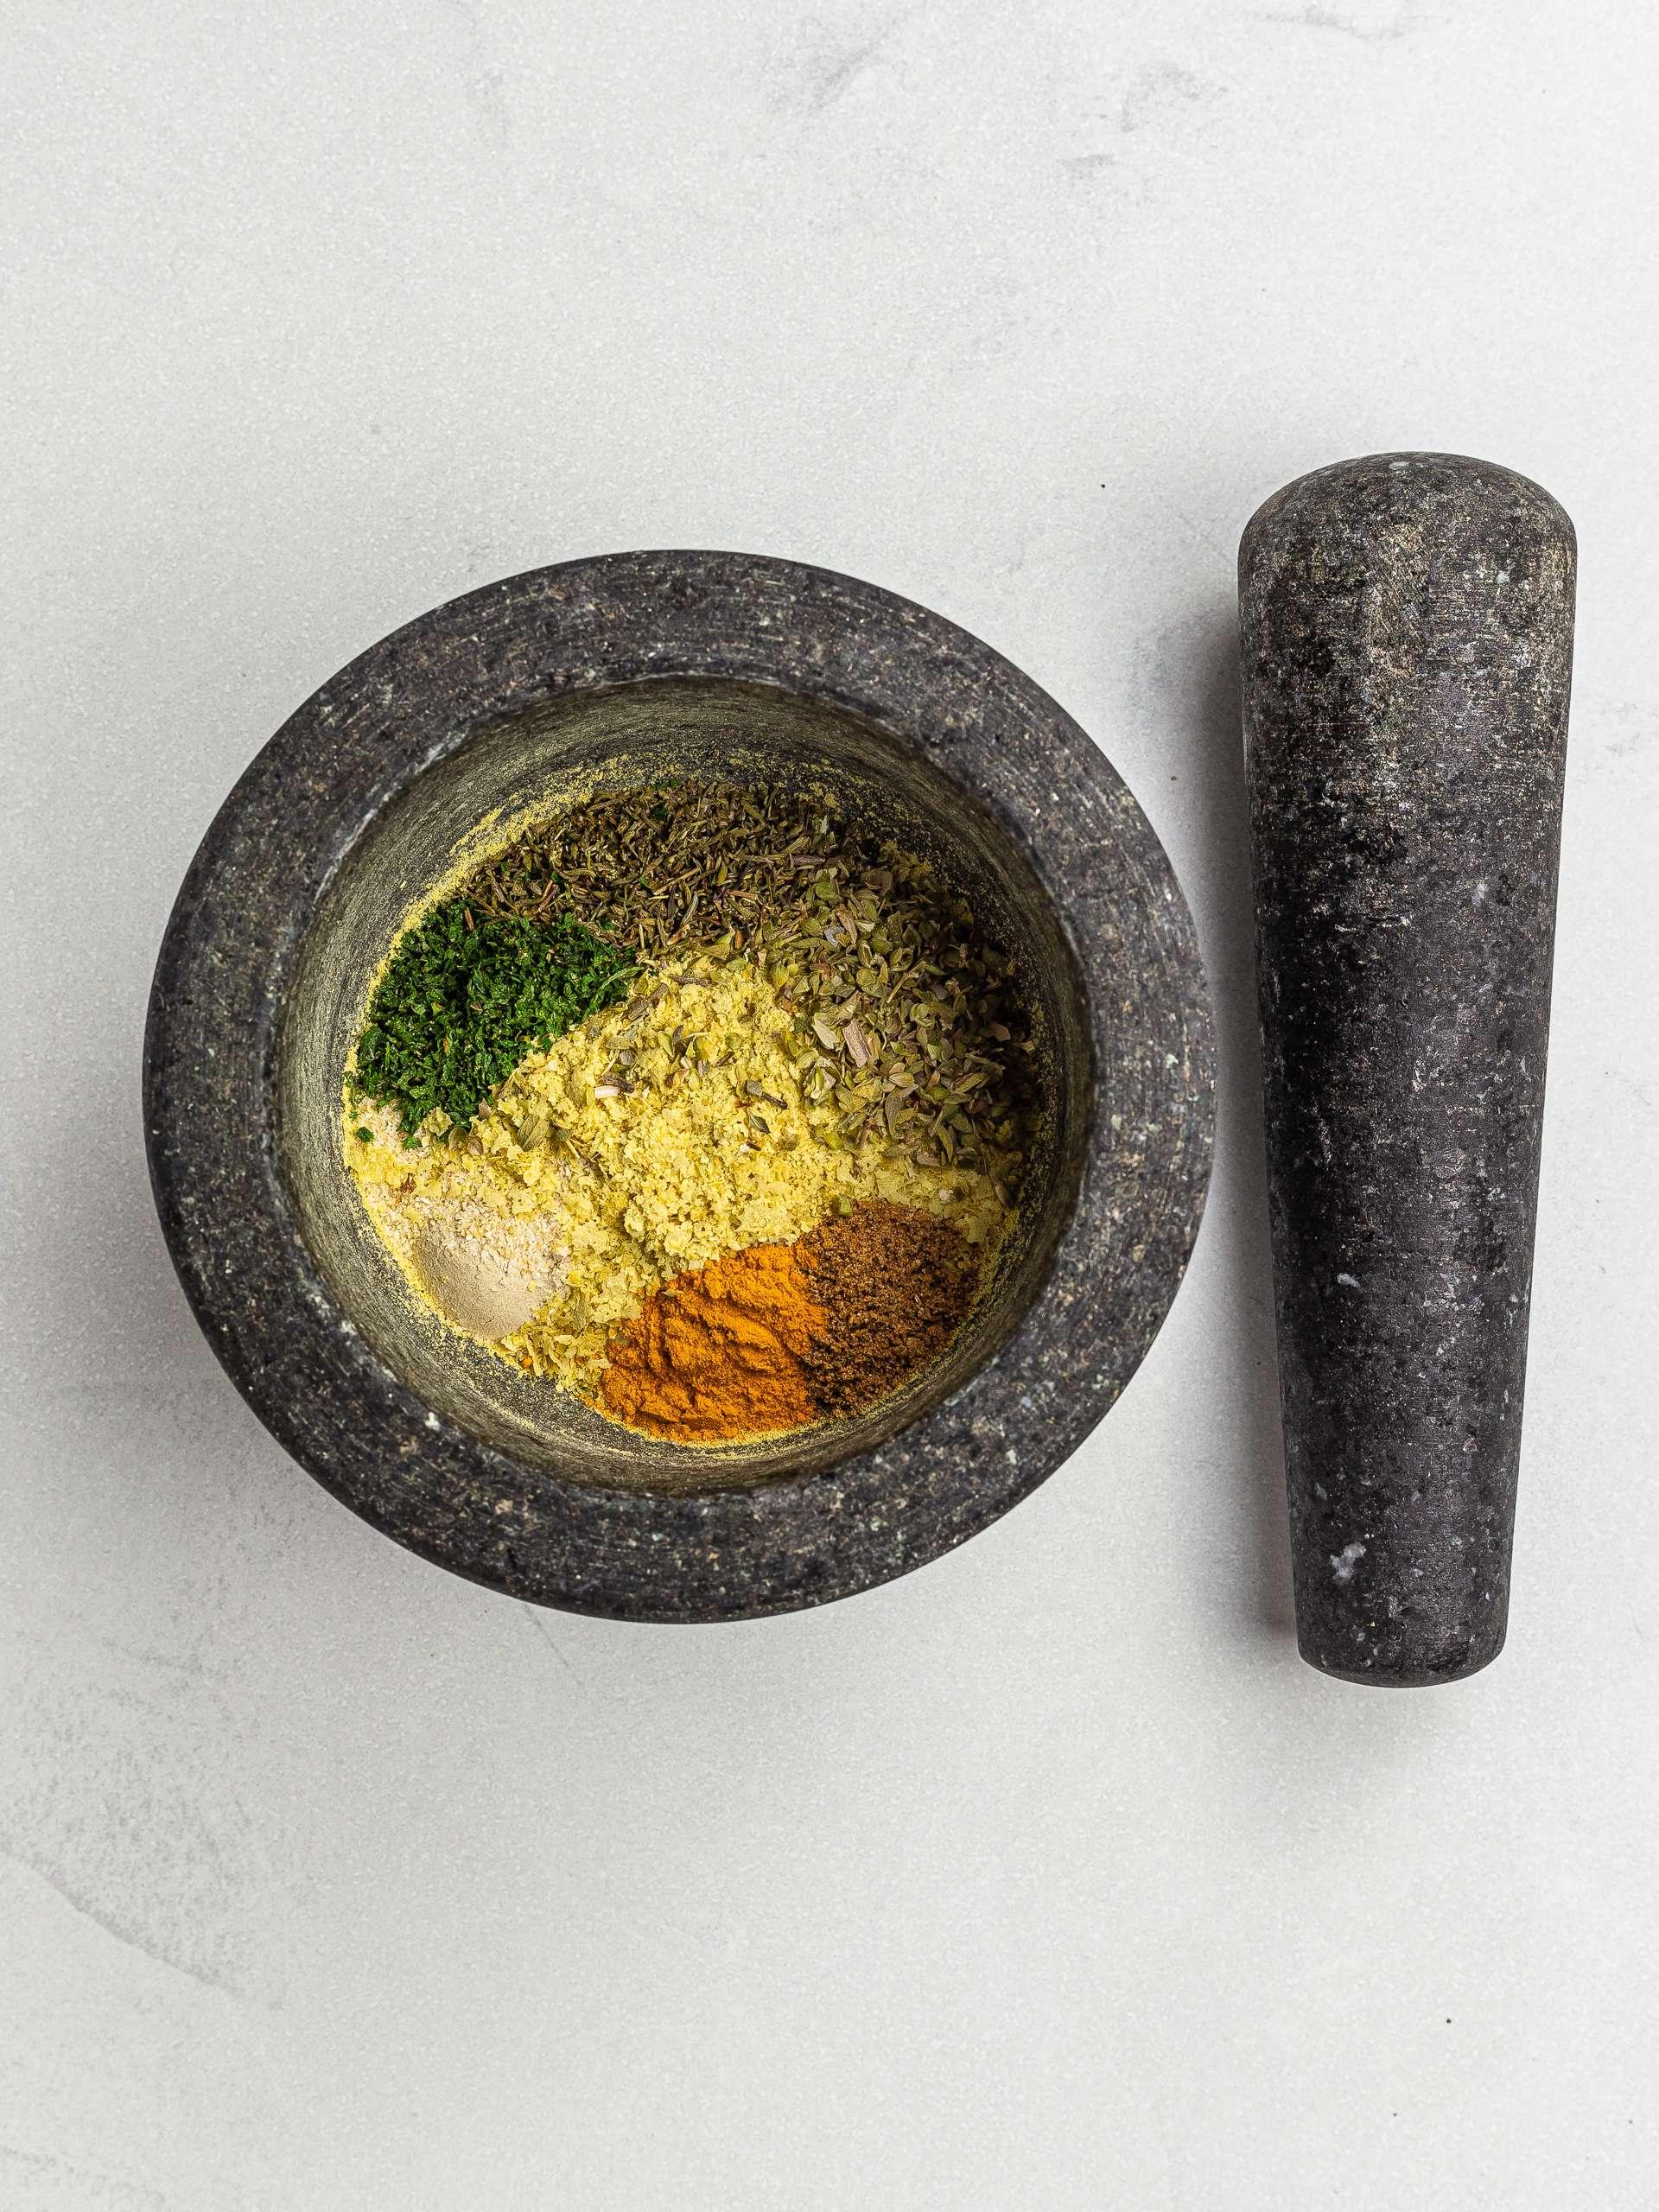 vegan bouillon power ingredients in a mortar